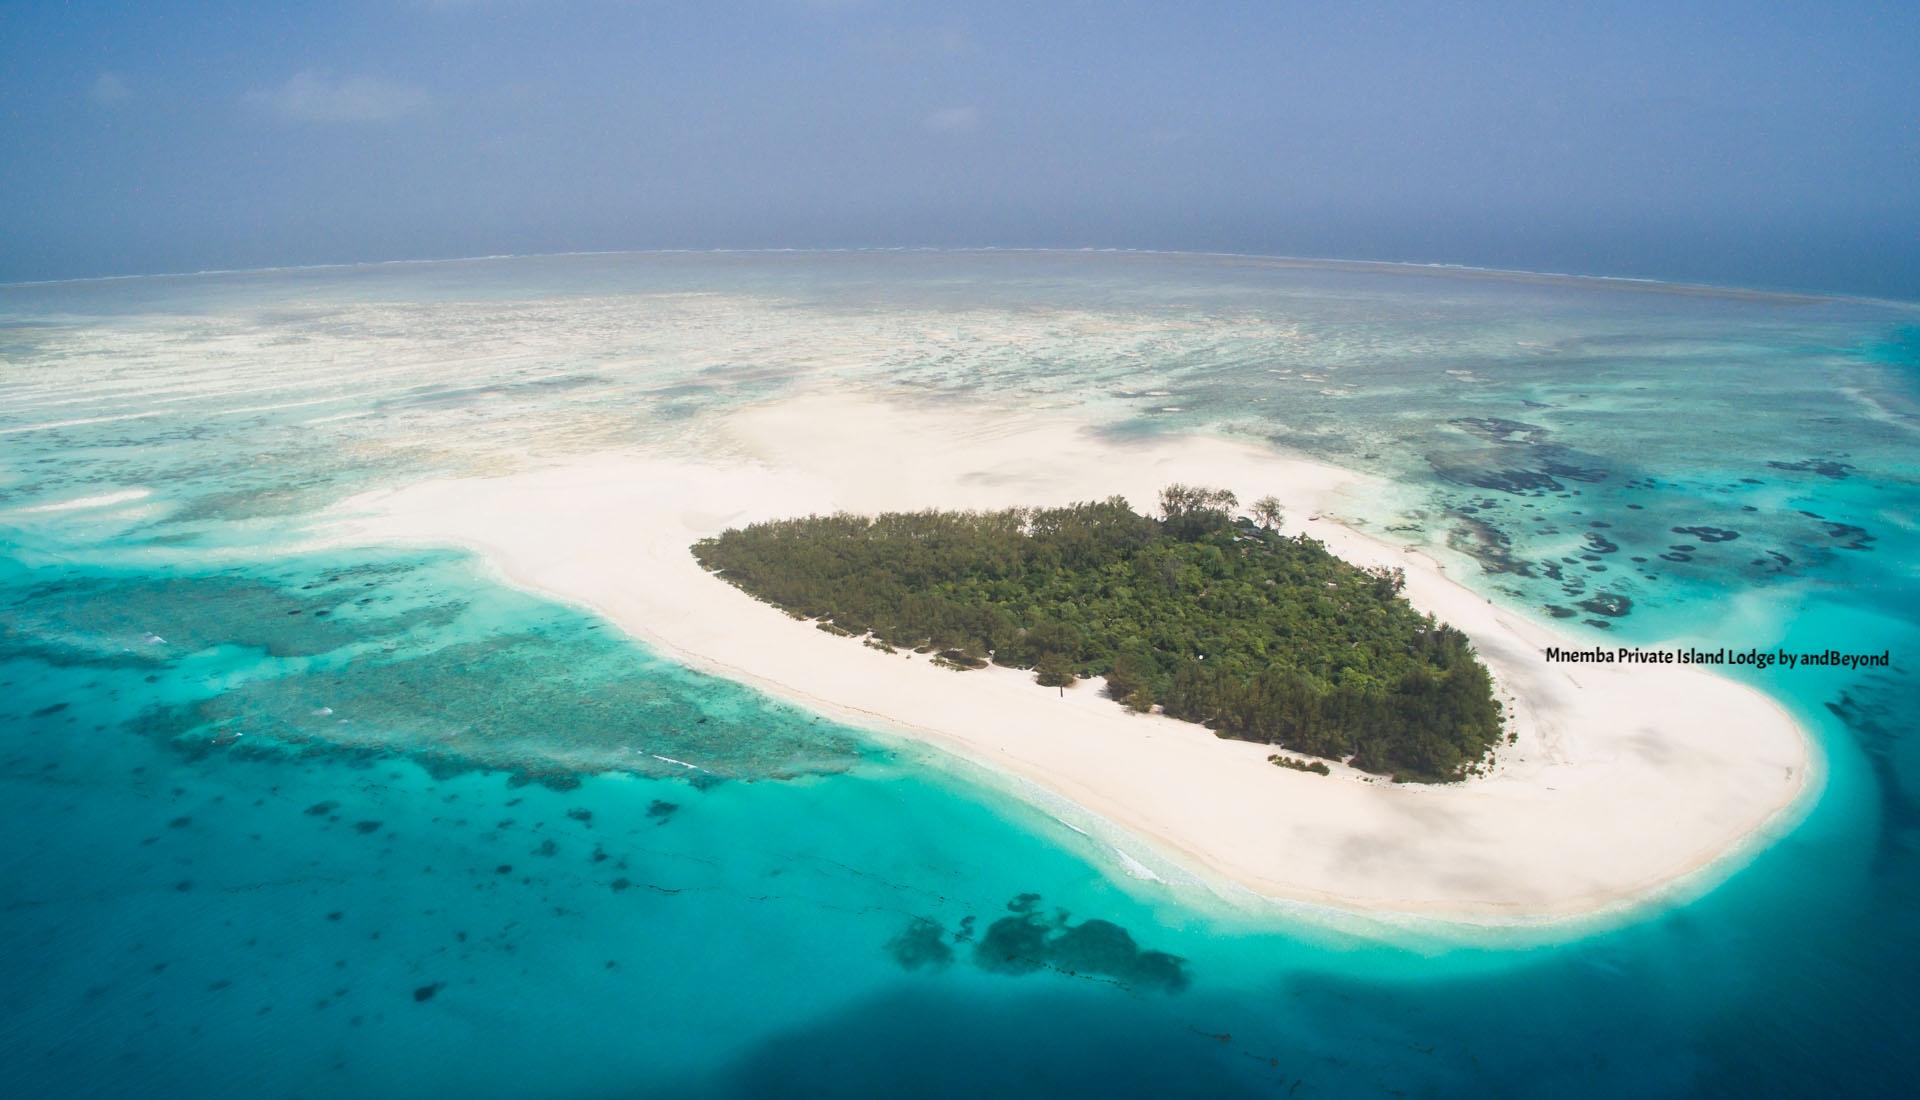 mnemba_island_andbeyond_takims_holidays.jpg